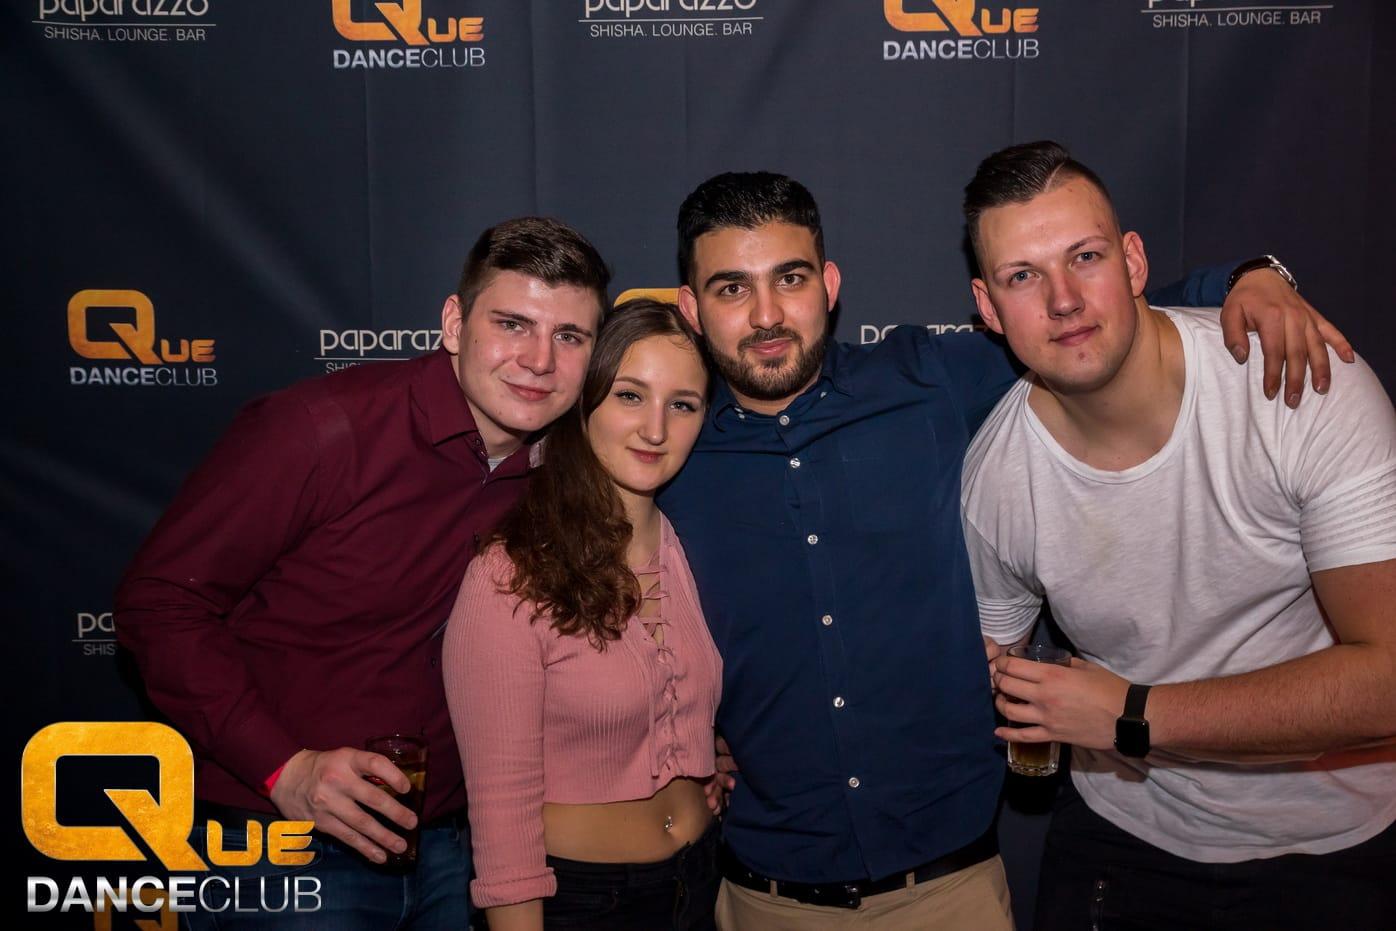 2018_12_08_Que_Danceclub_Paparazzo_Night_Ardian_Bujupi_Live_Nightlife_Scene_Timo_069